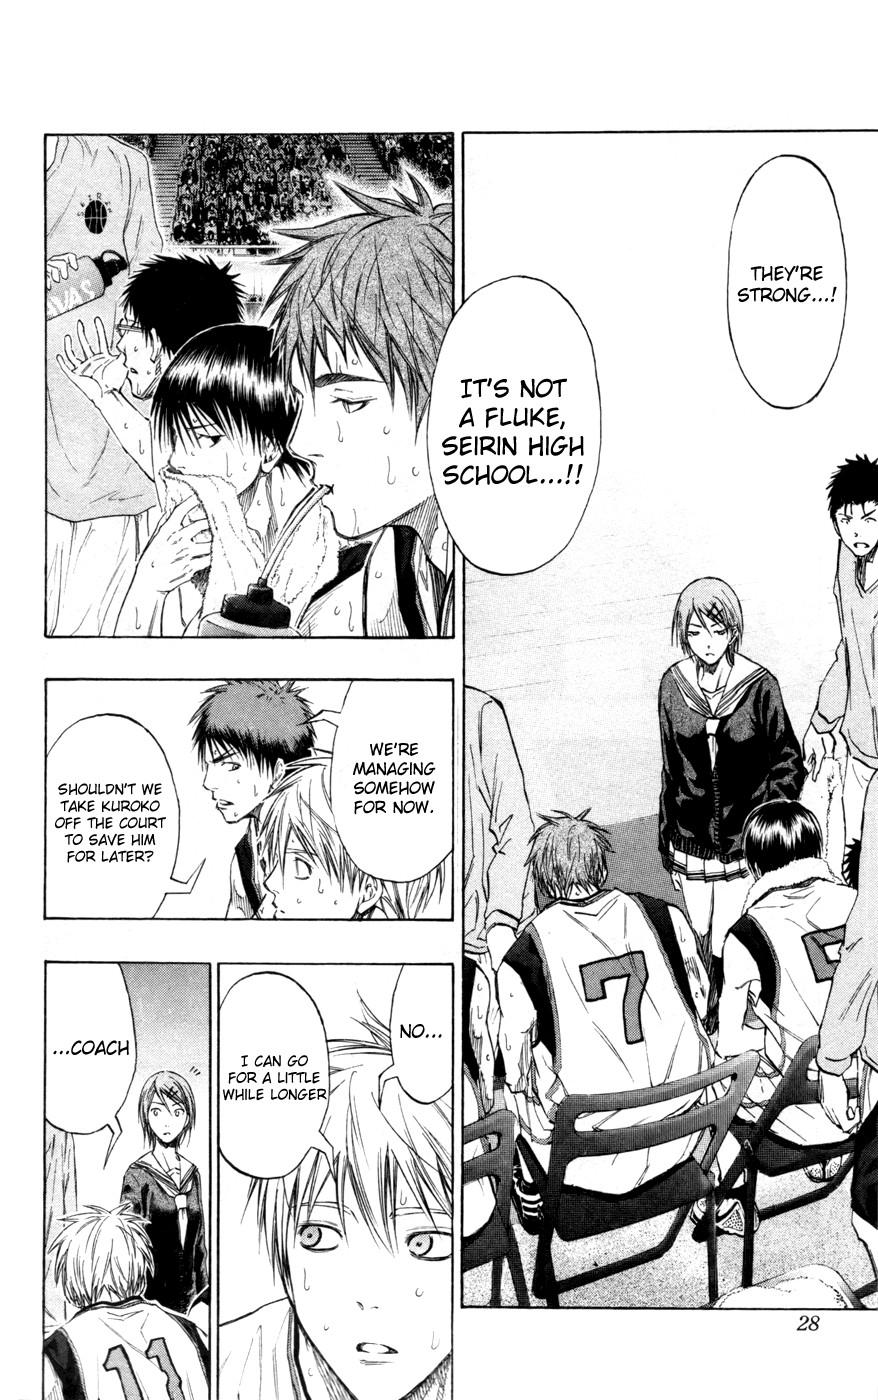 Kuroko no Basket Manga Chapter 119 - Image 4_028